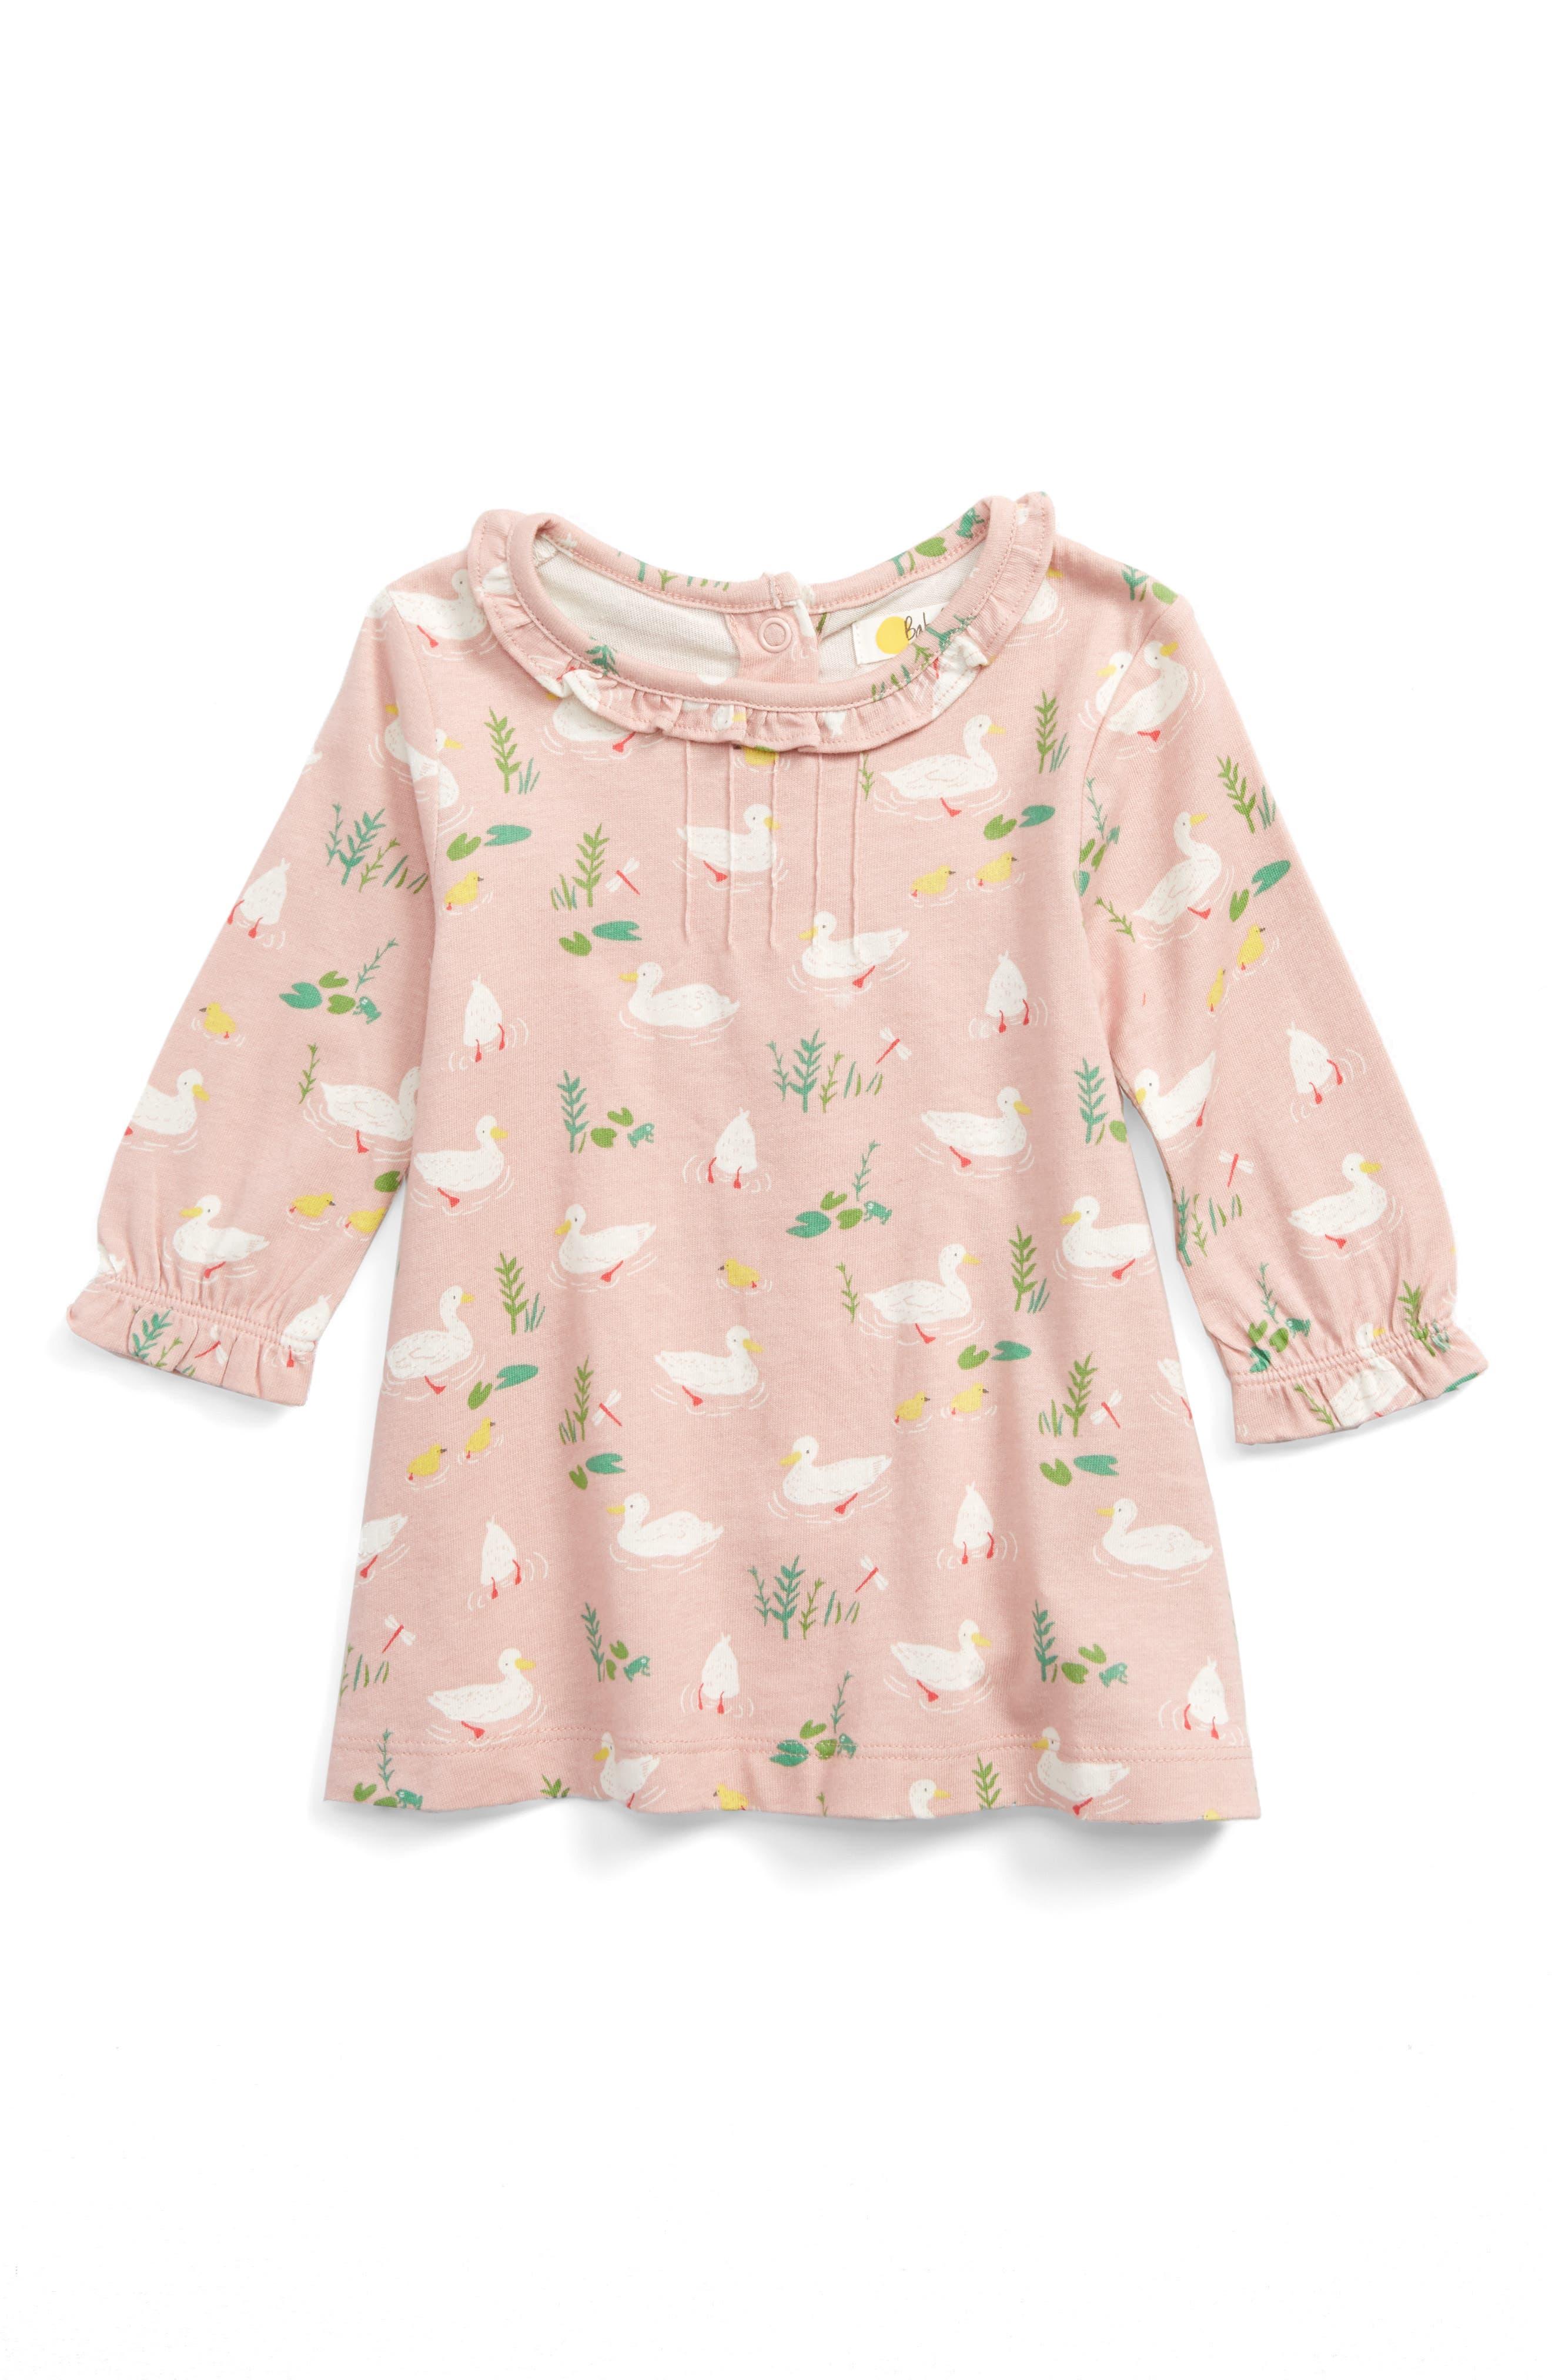 Main Image - Mini Boden Pretty Print Jersey Dress (Baby Girls & Toddler Girls)